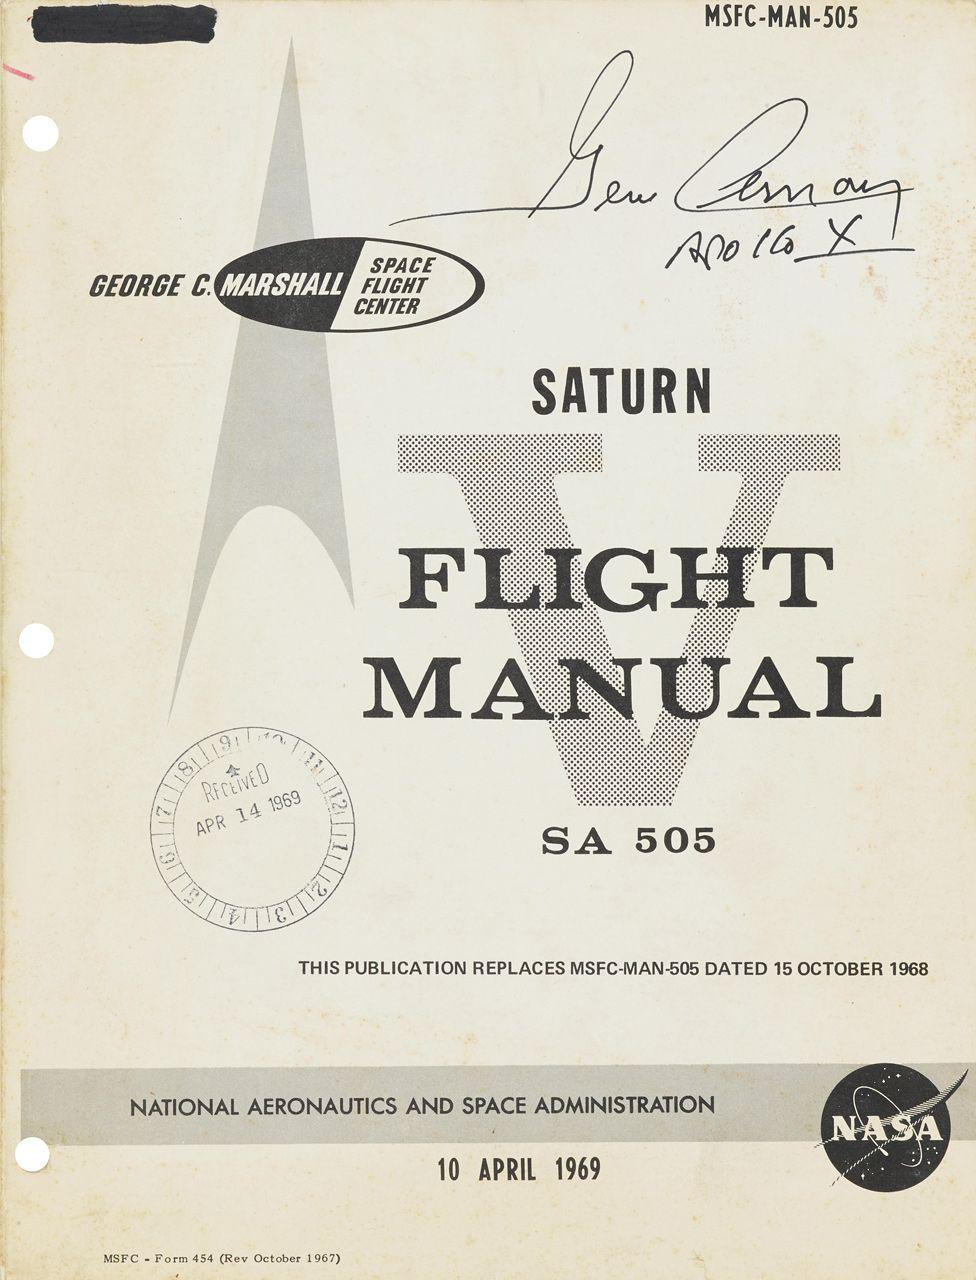 apollo spacecraft manual - photo #11